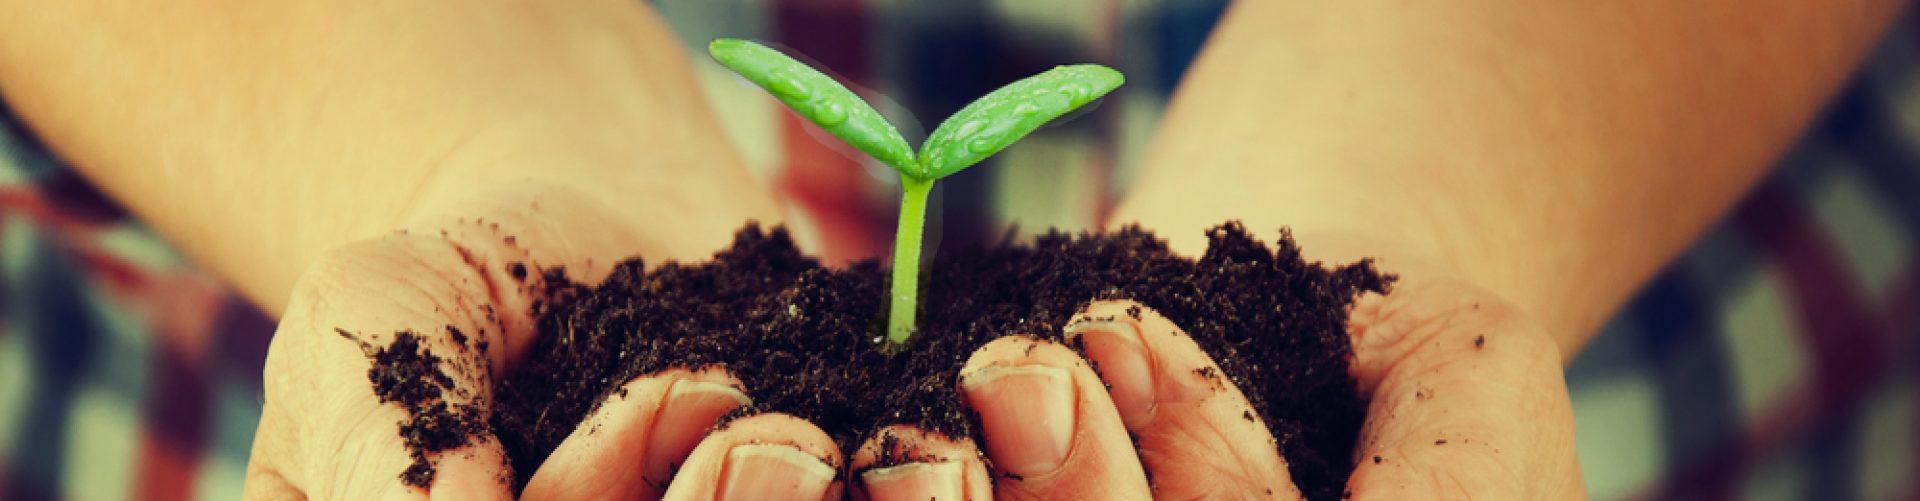 Natural News Revista de salud natural, ecología, medicina, deporte...